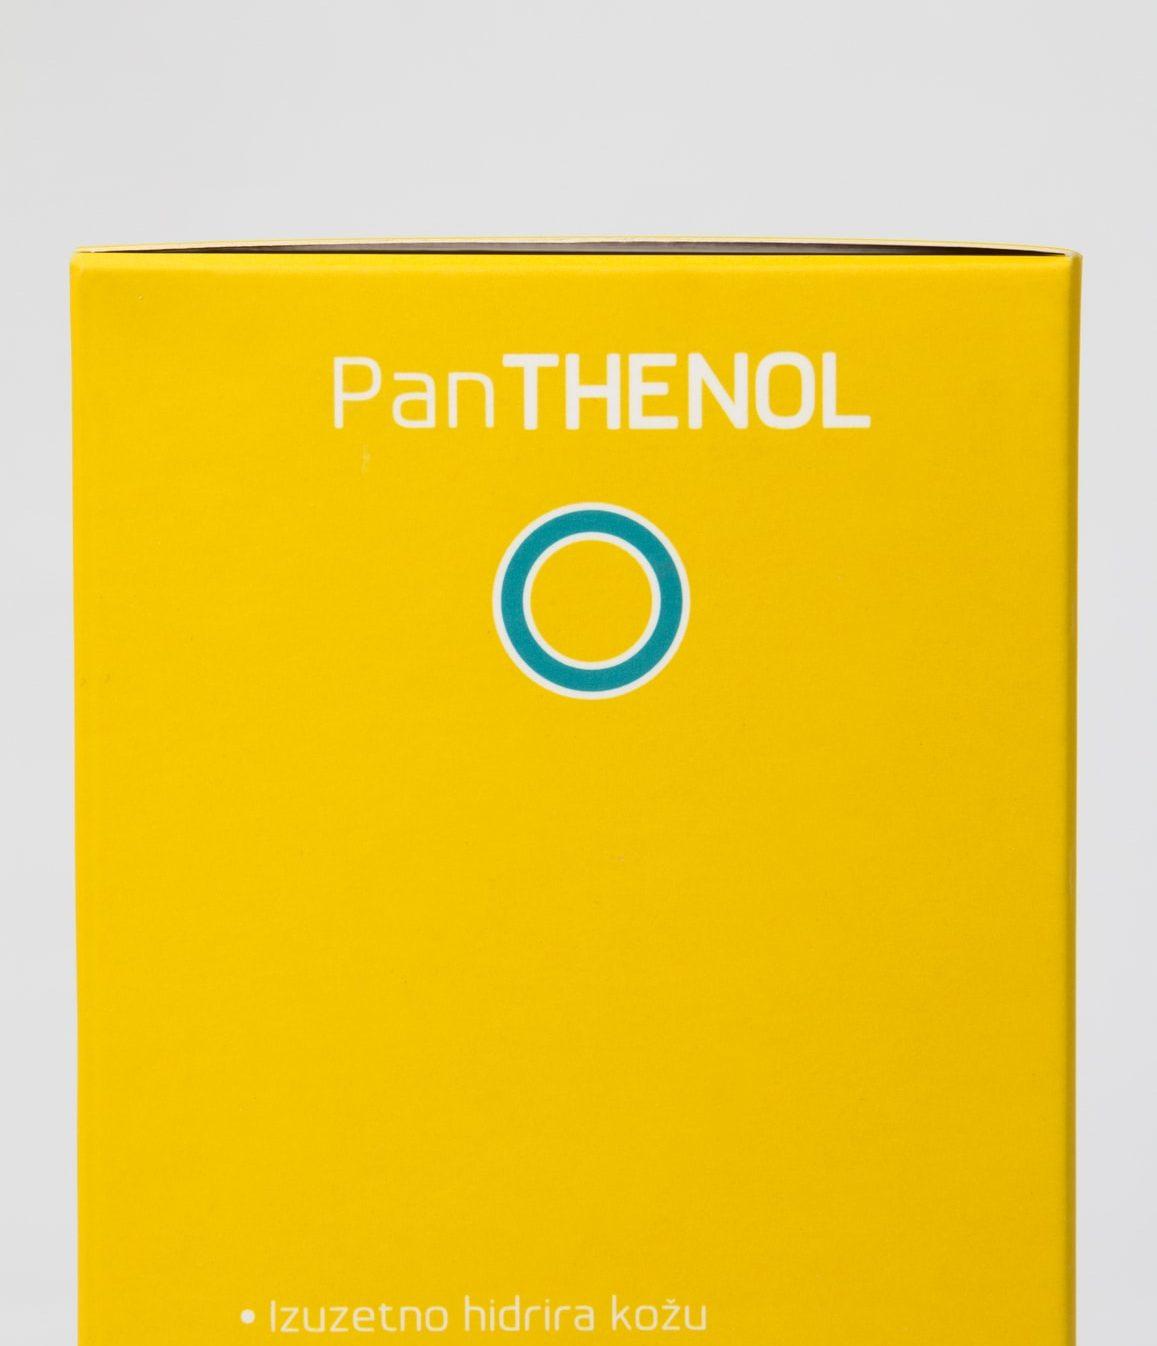 DrKozarev_Cosmetics_Shonski_packaging_MedBeautyLine_Panthenol_2